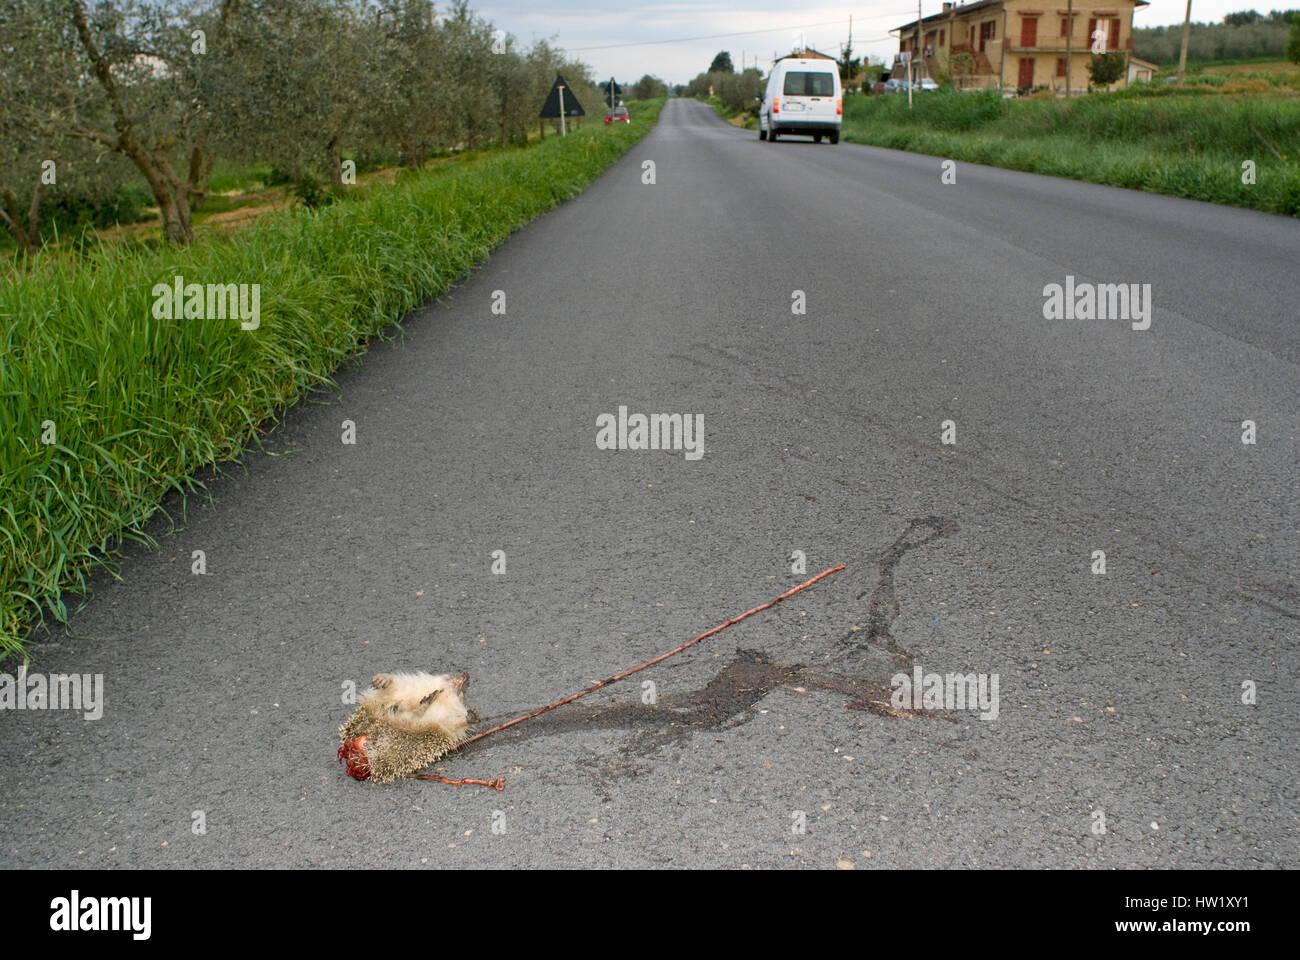 Hedgehog (Erinaceus europaeus) killed on the road, Tuscany, Italy - Stock Image